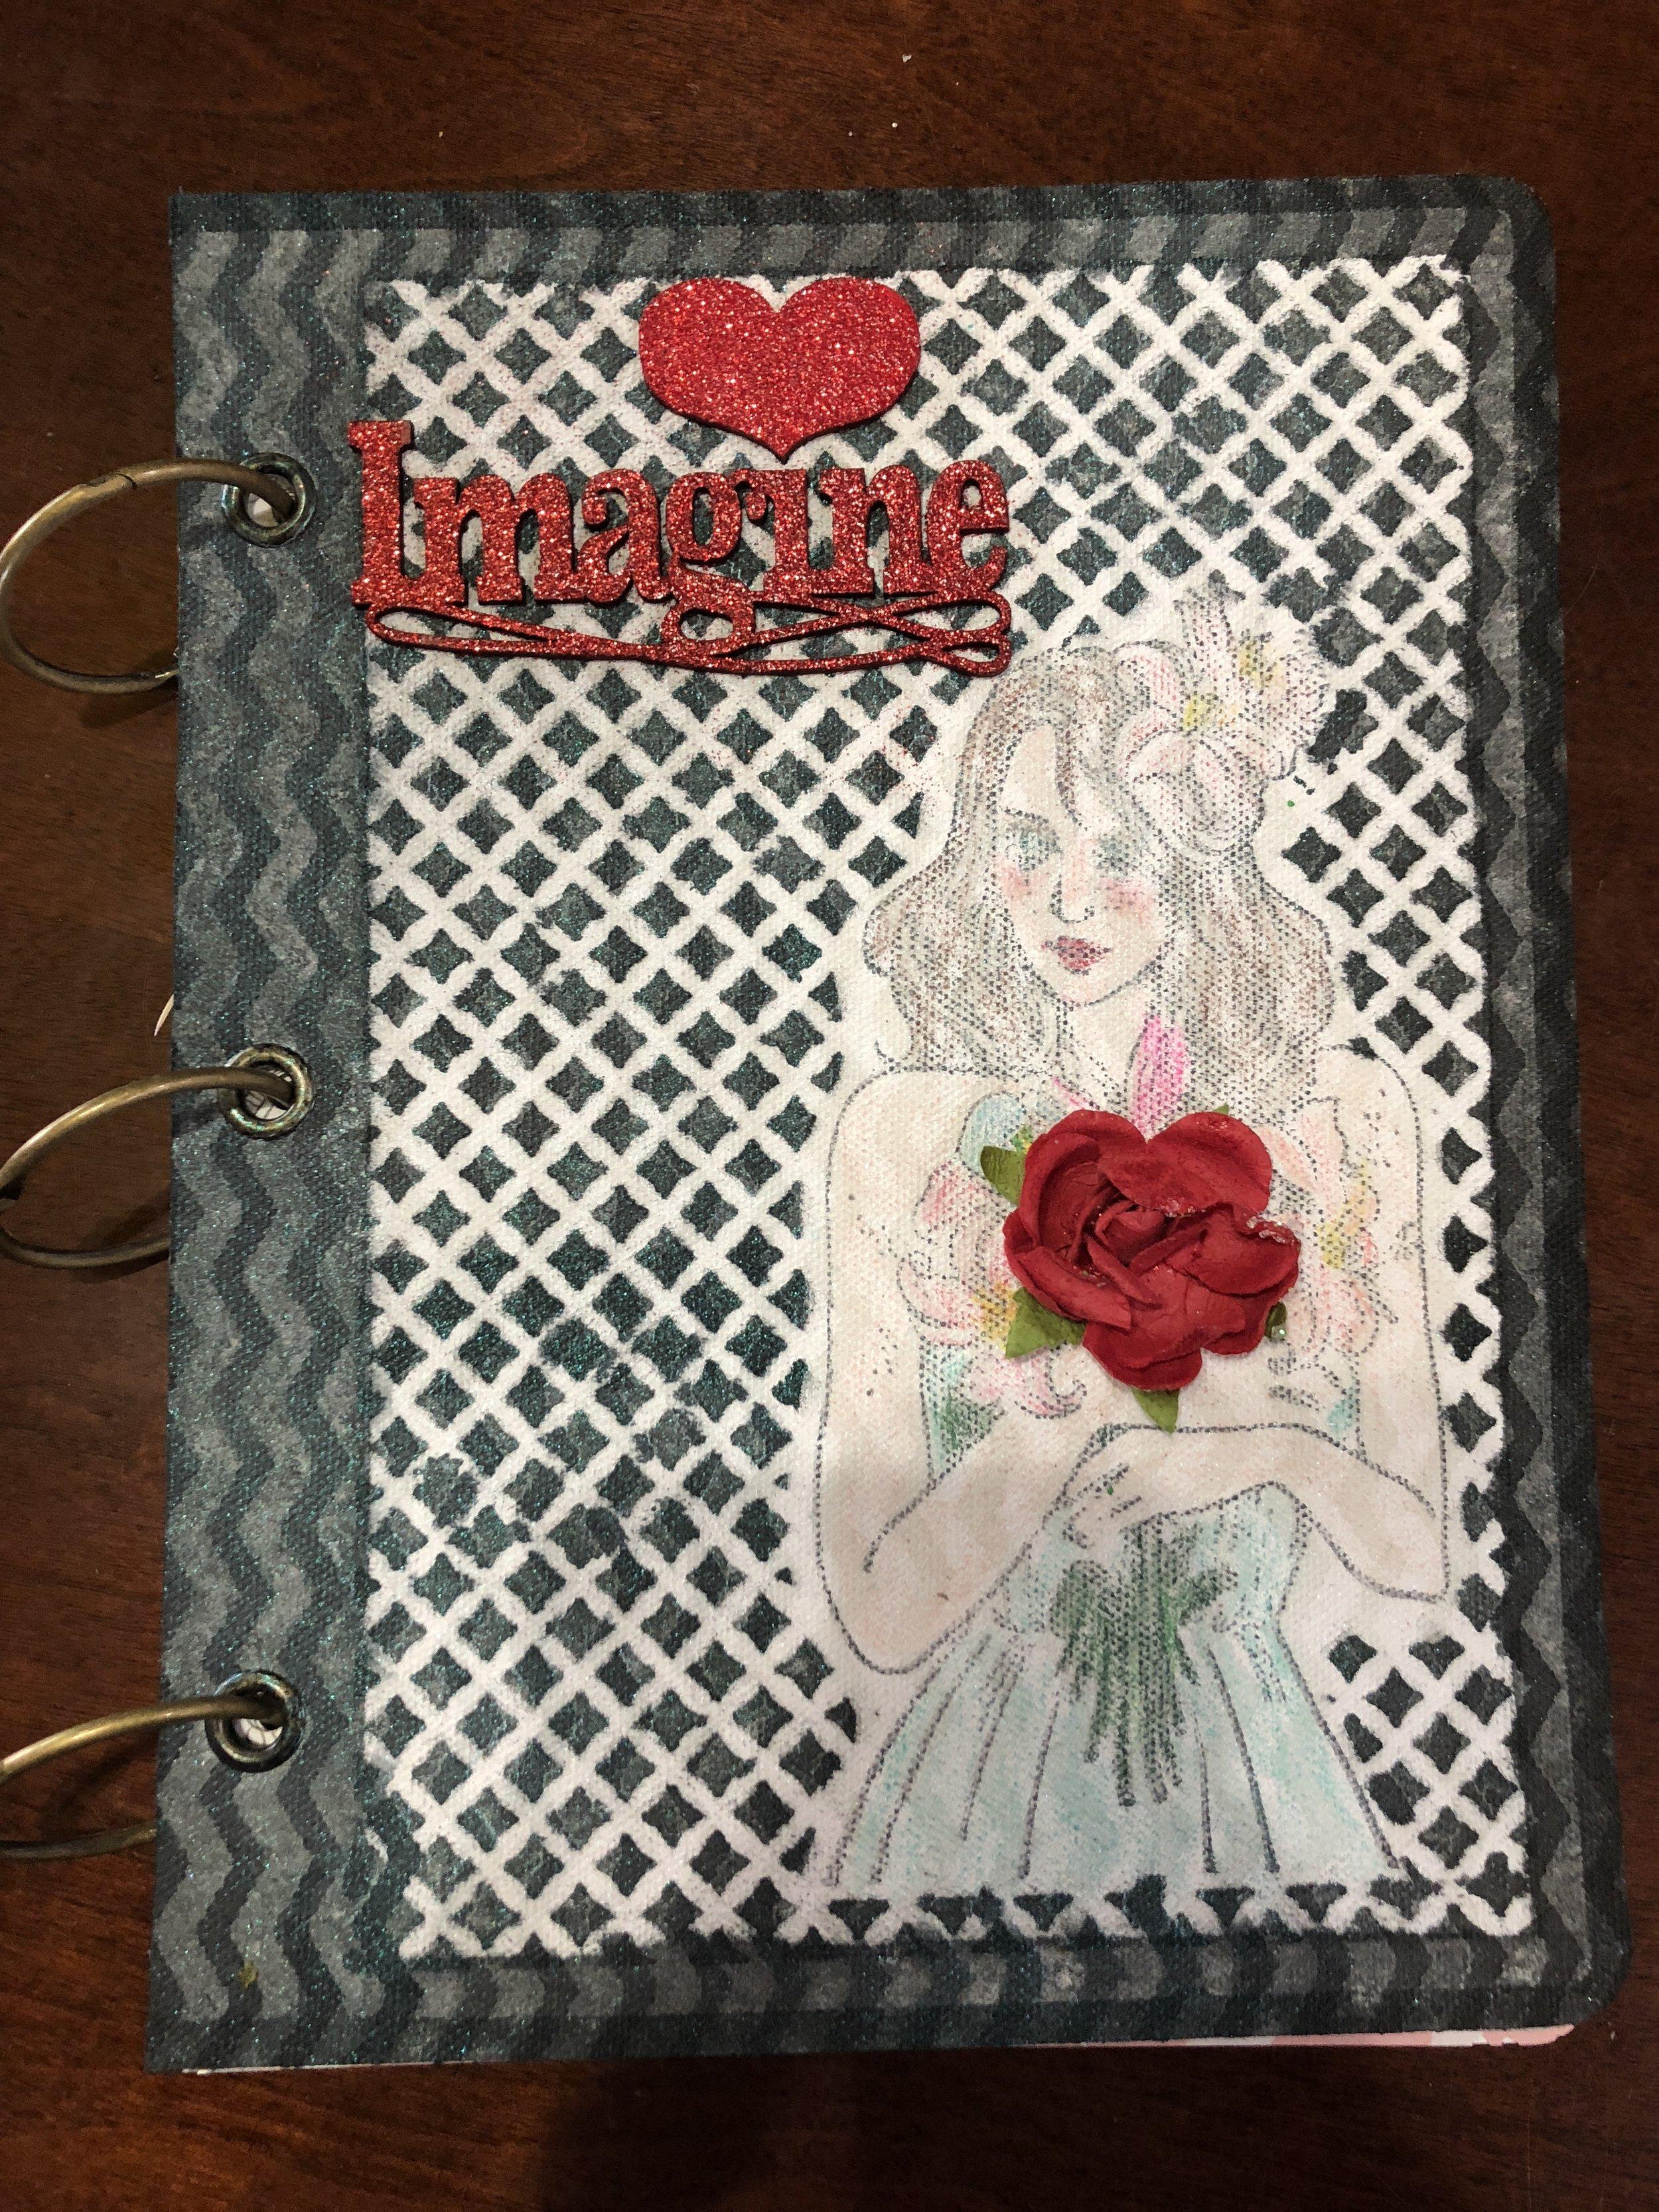 Daria's Journal